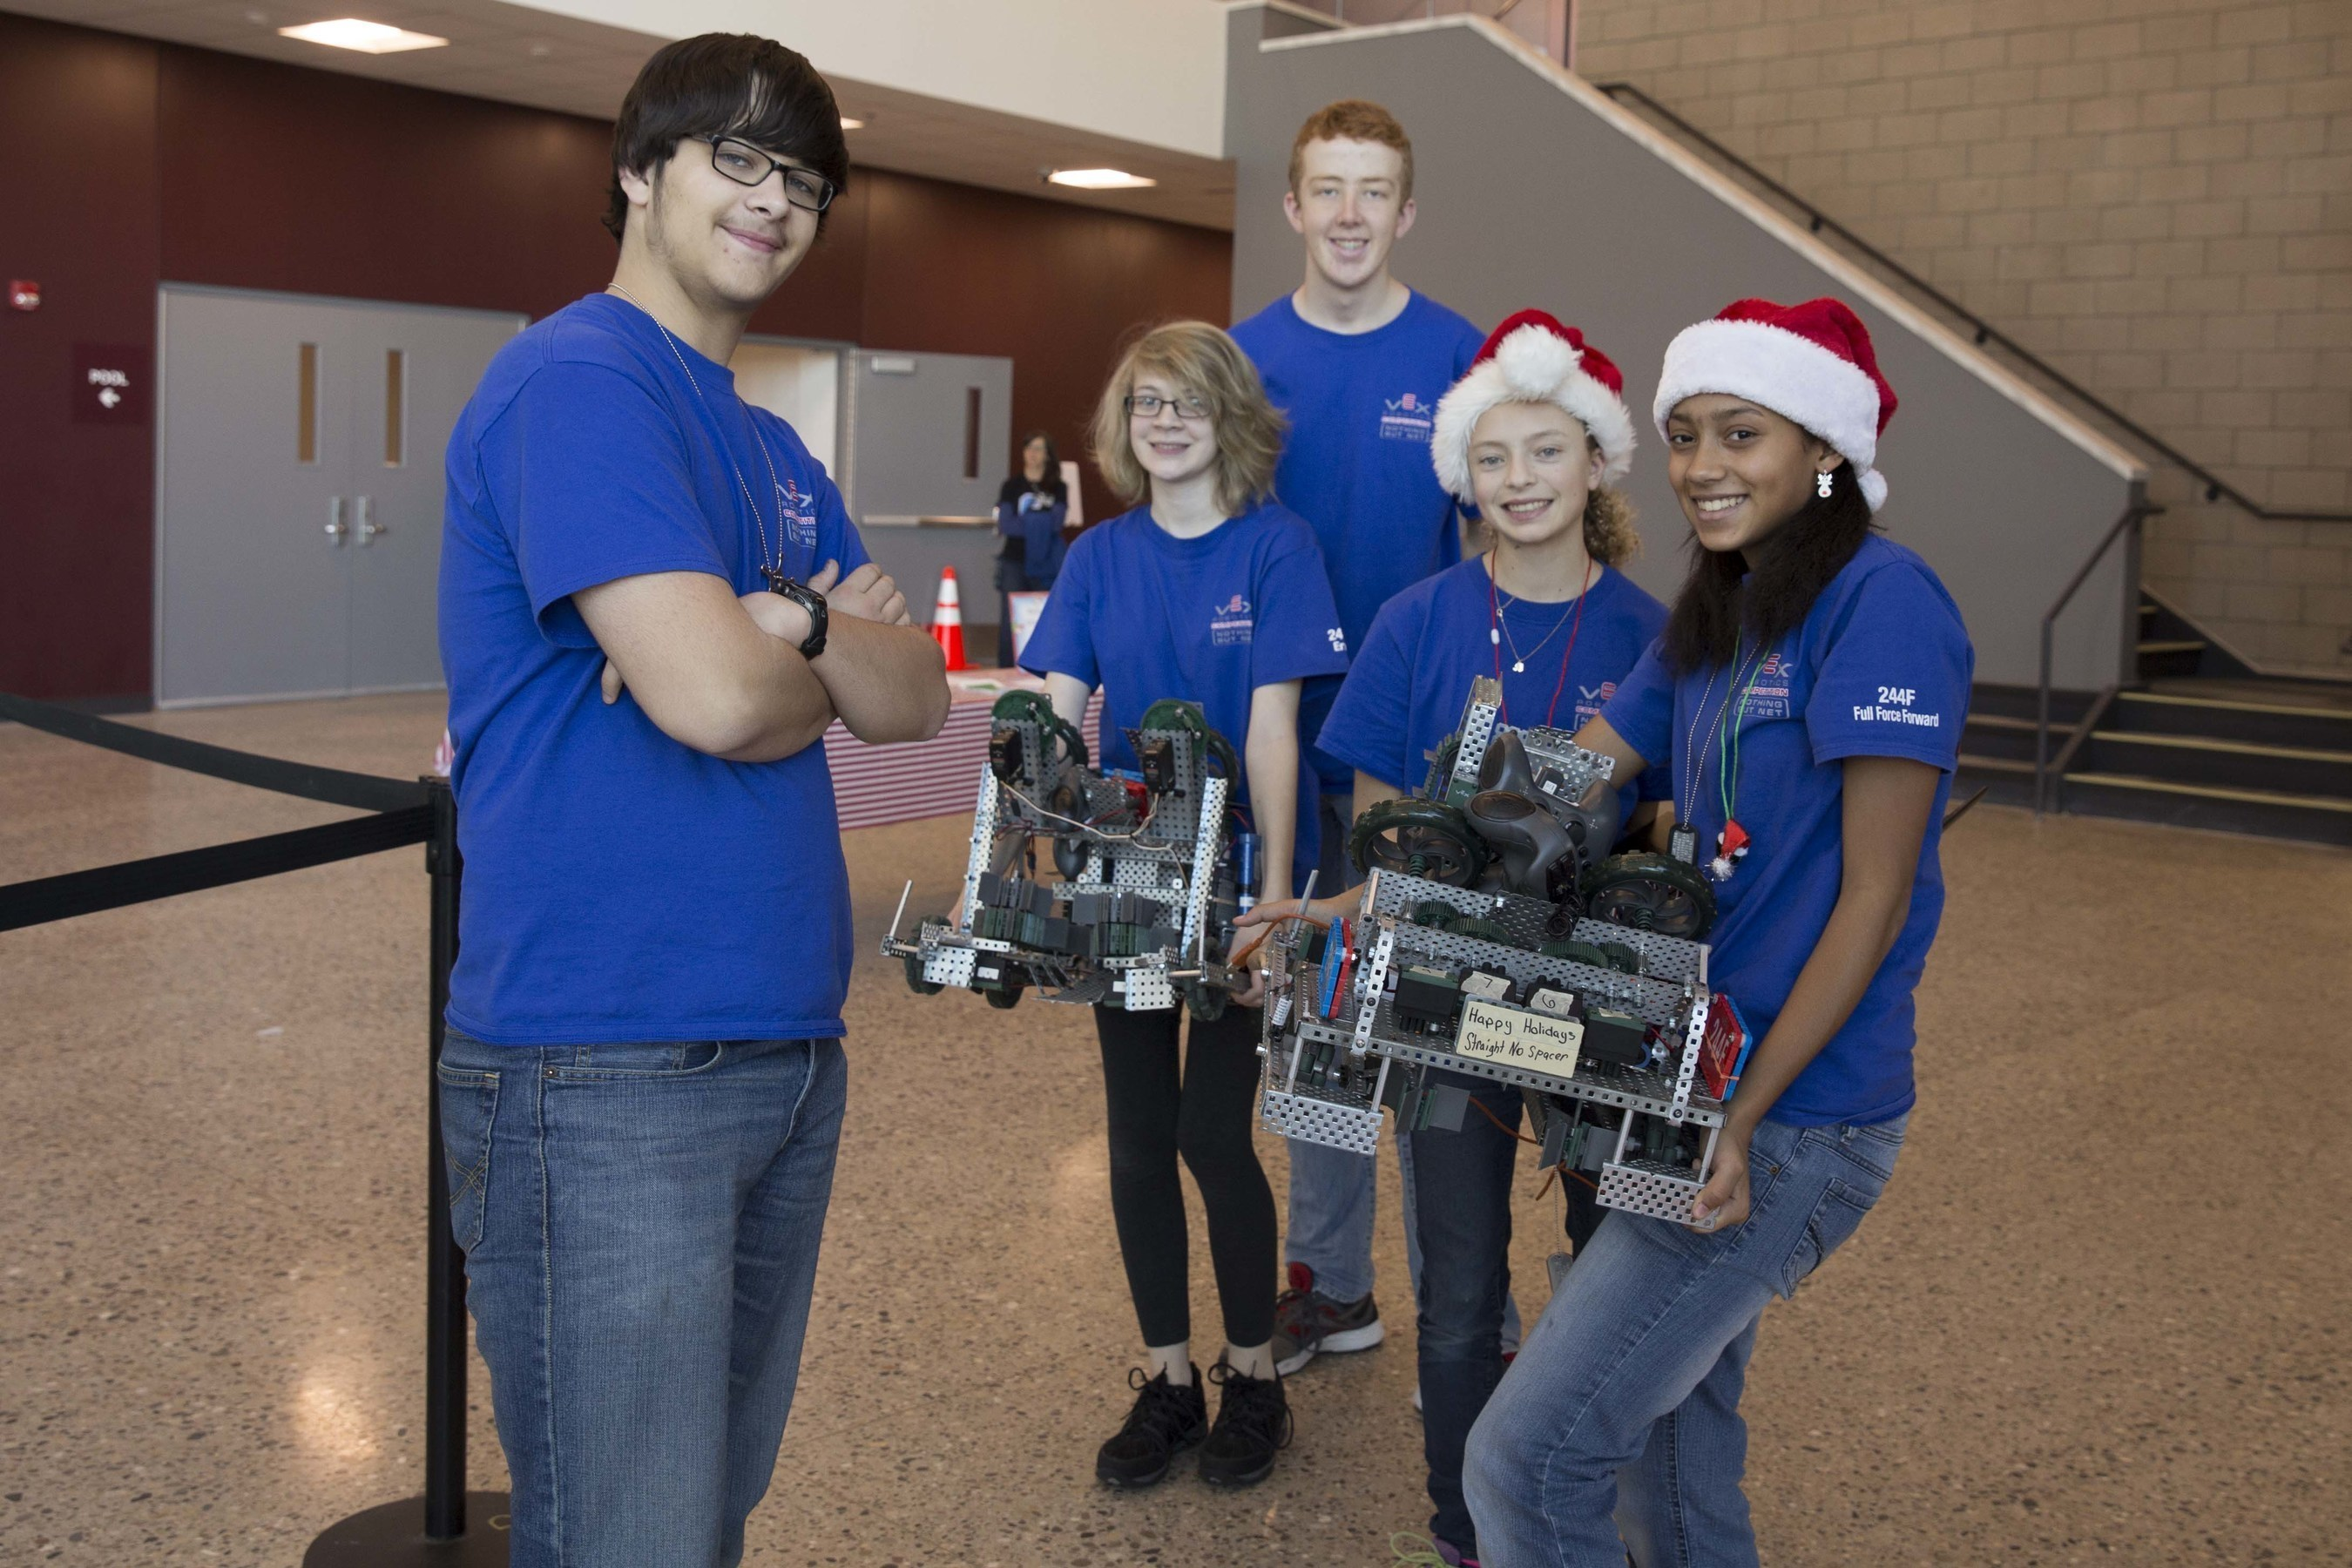 Grandville Public Schools to Host Ten VEX Robotics Competitions